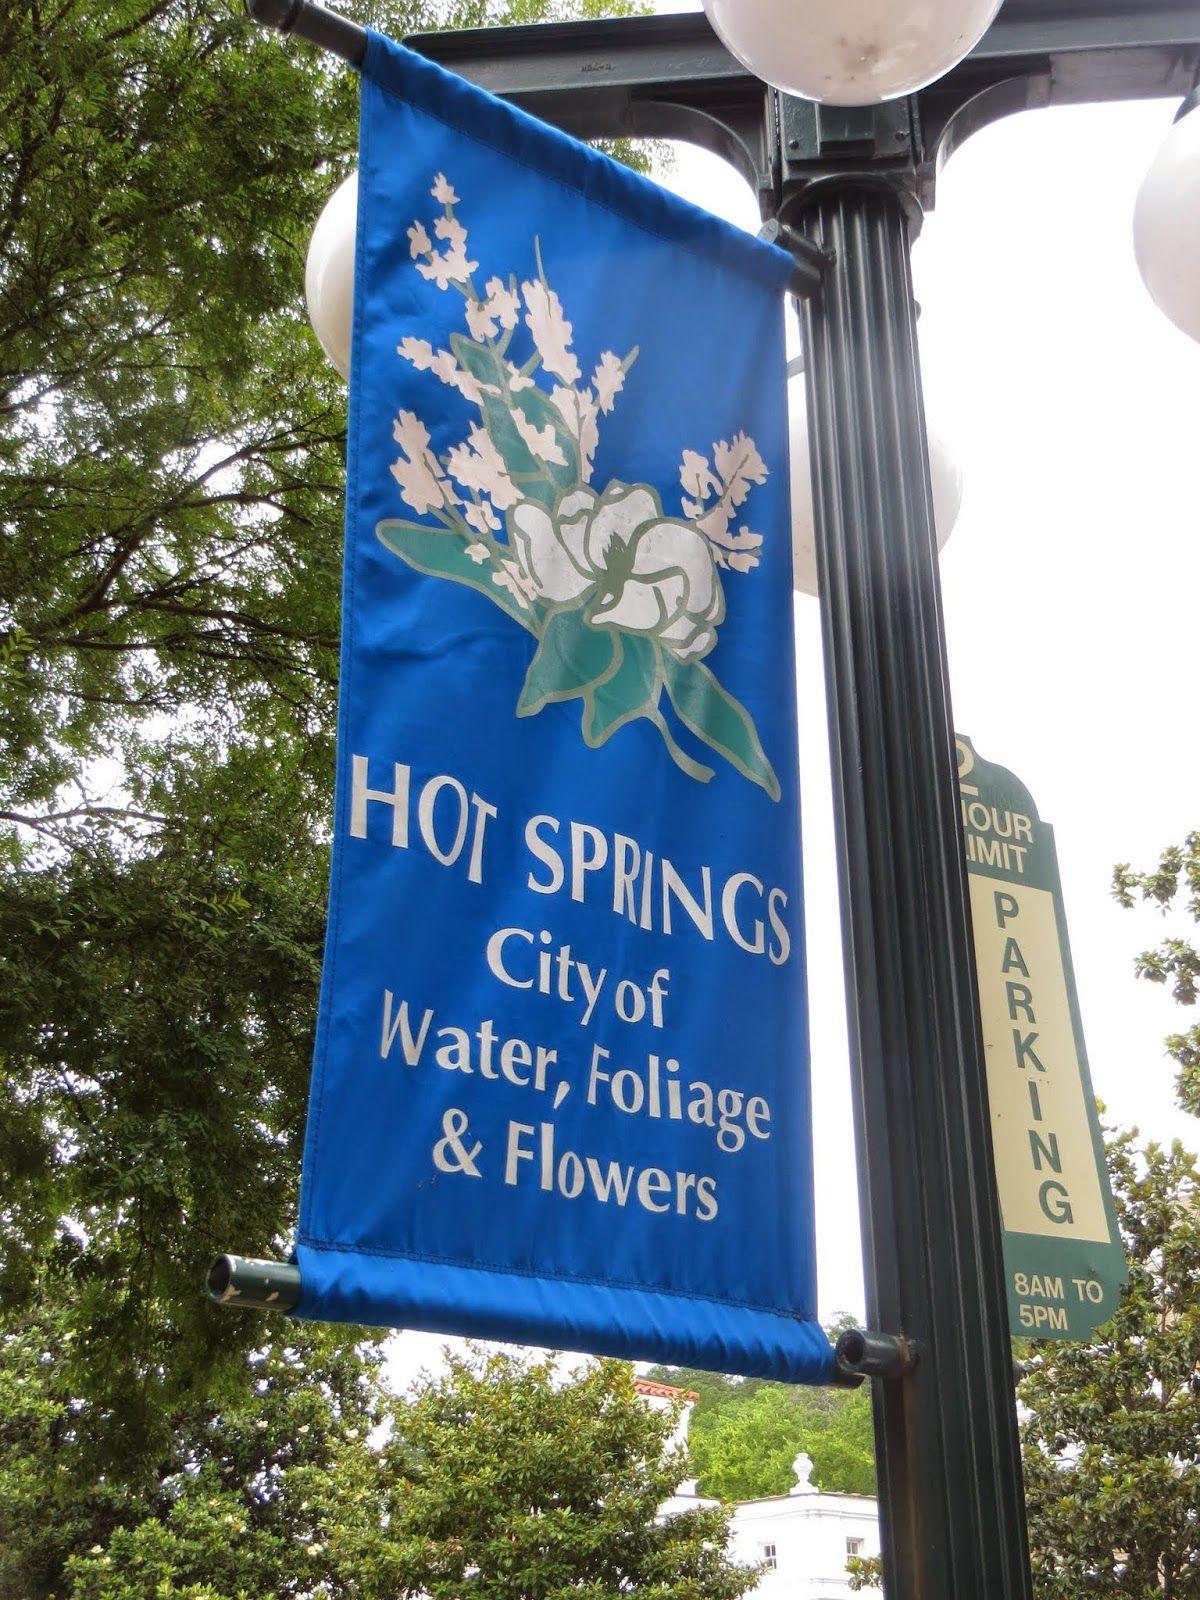 Hot Springs National Park Hot Springs National Park Hot Springs National Parks